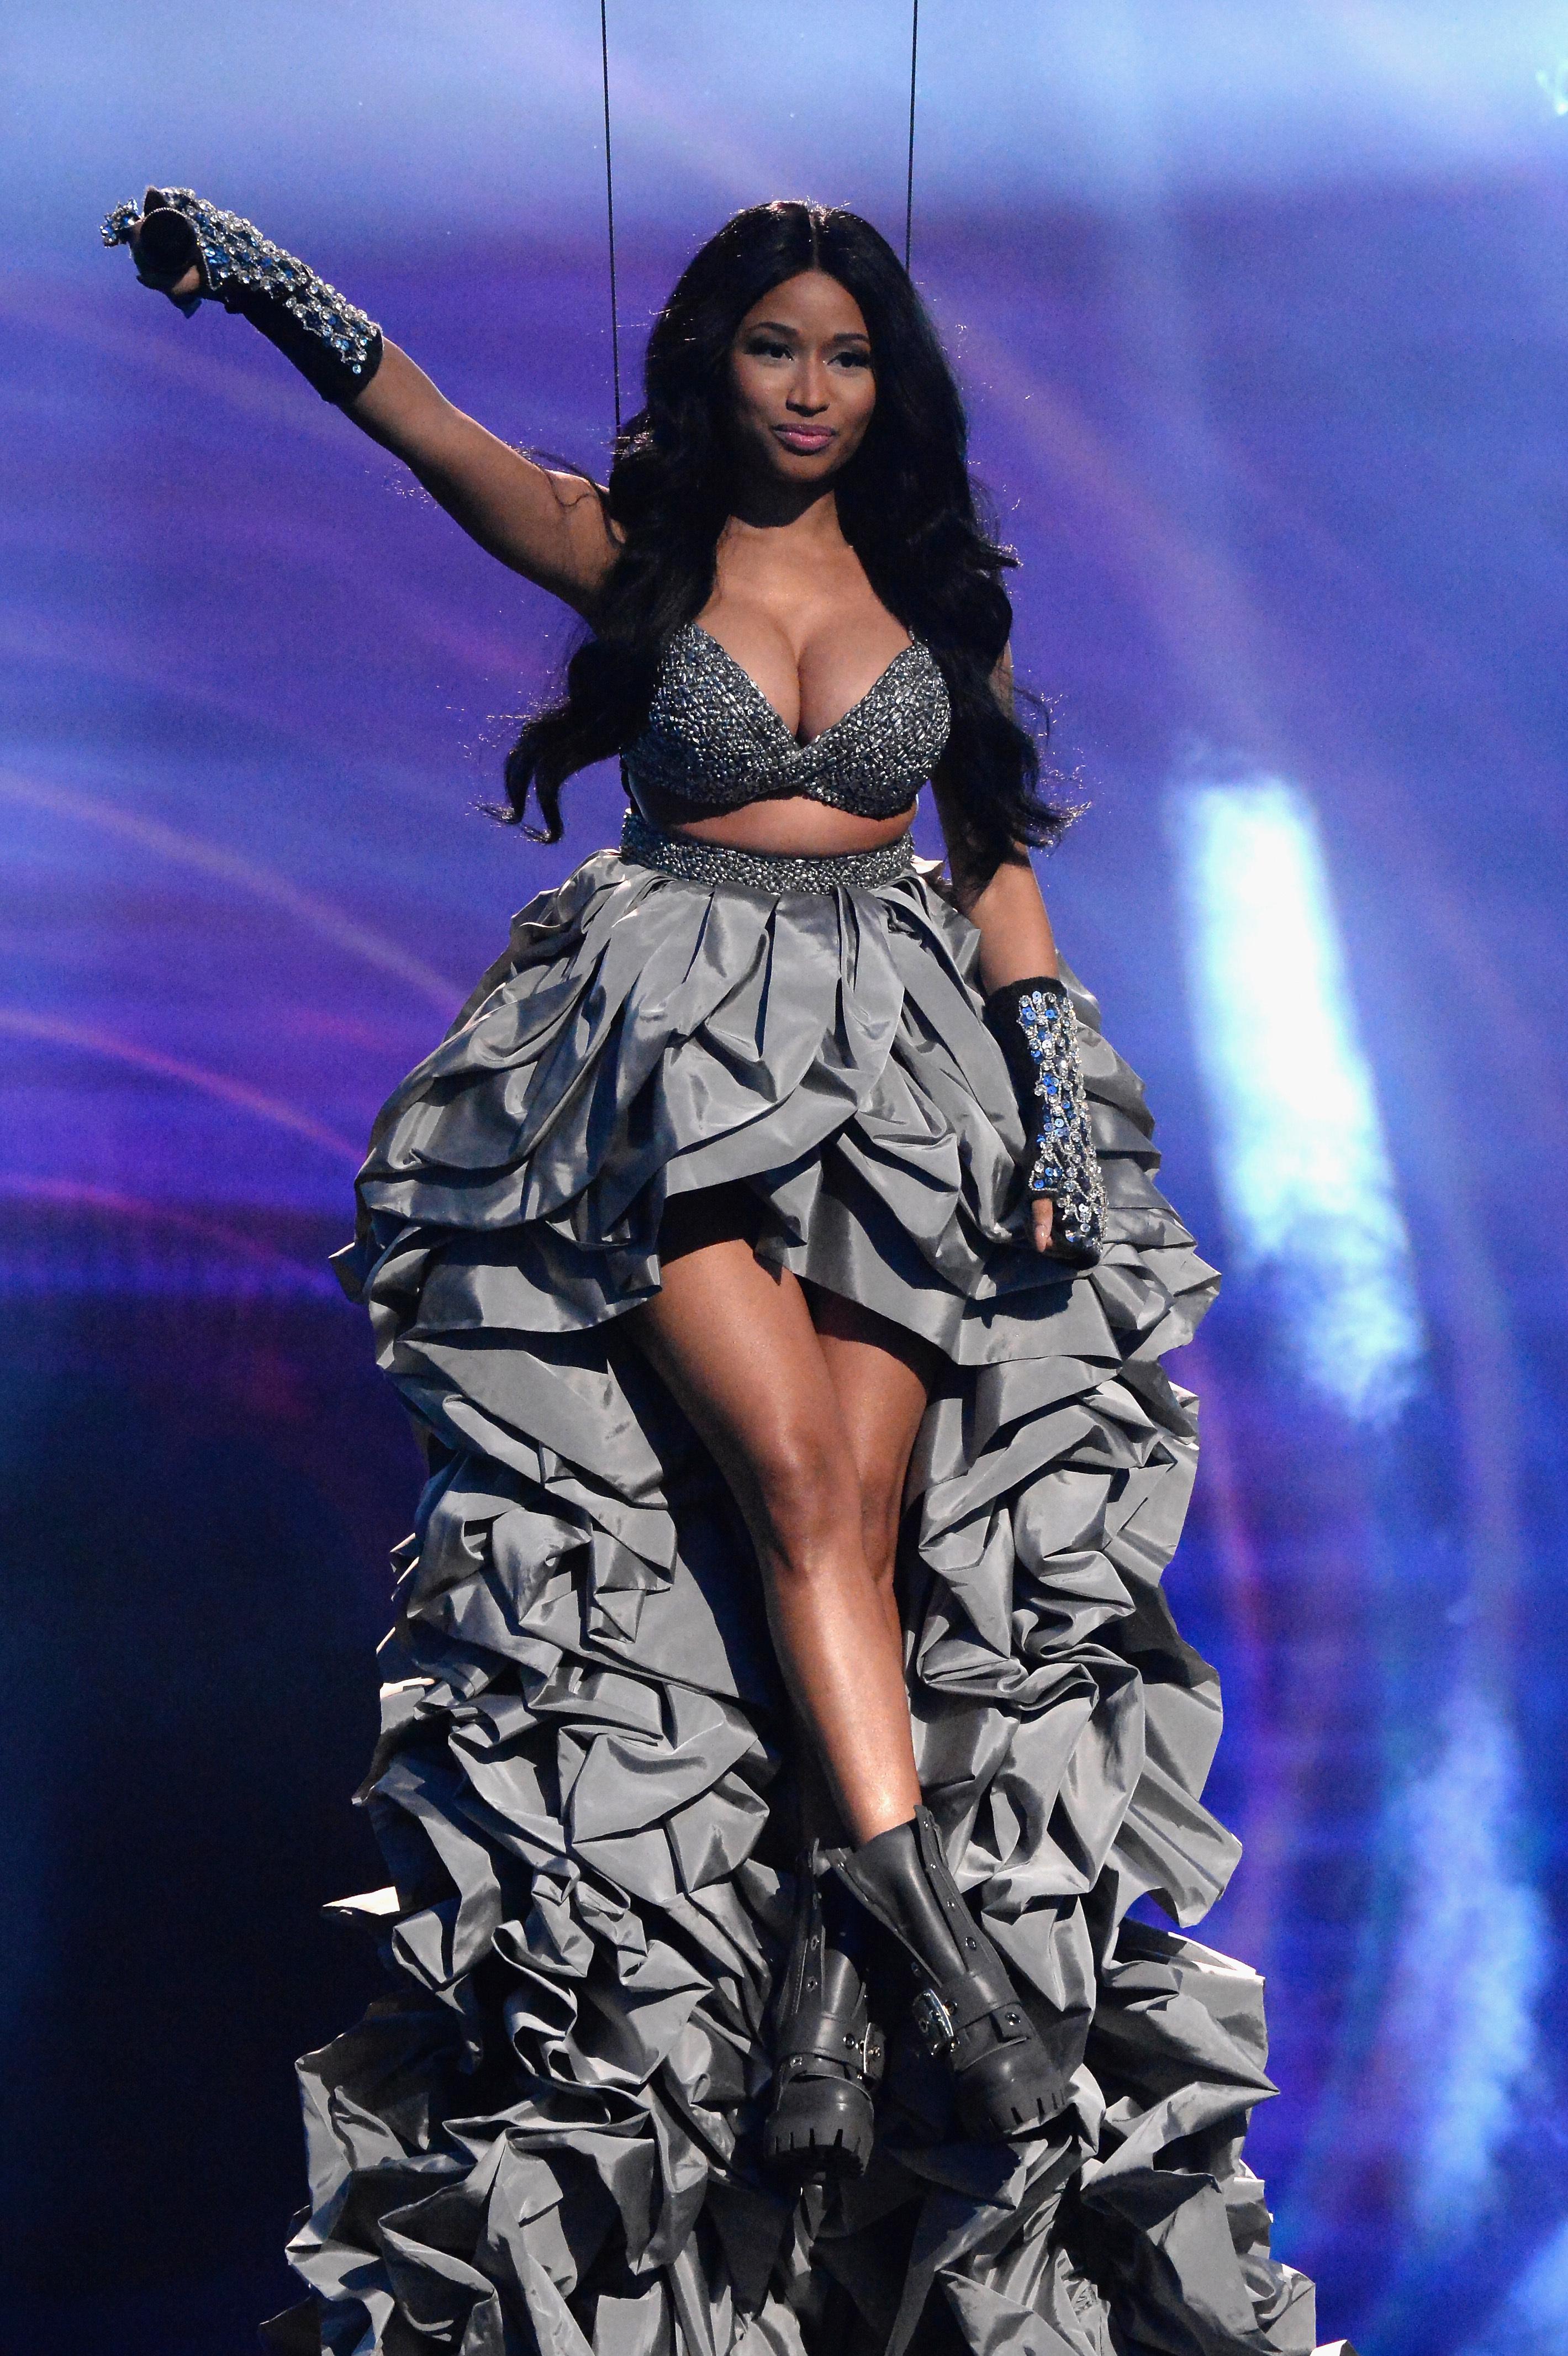 Nicki Minaj hosts the MTV Europe Music Awards 2014 at The Hydro in Glasgow, Scotland on November 9, 2014.